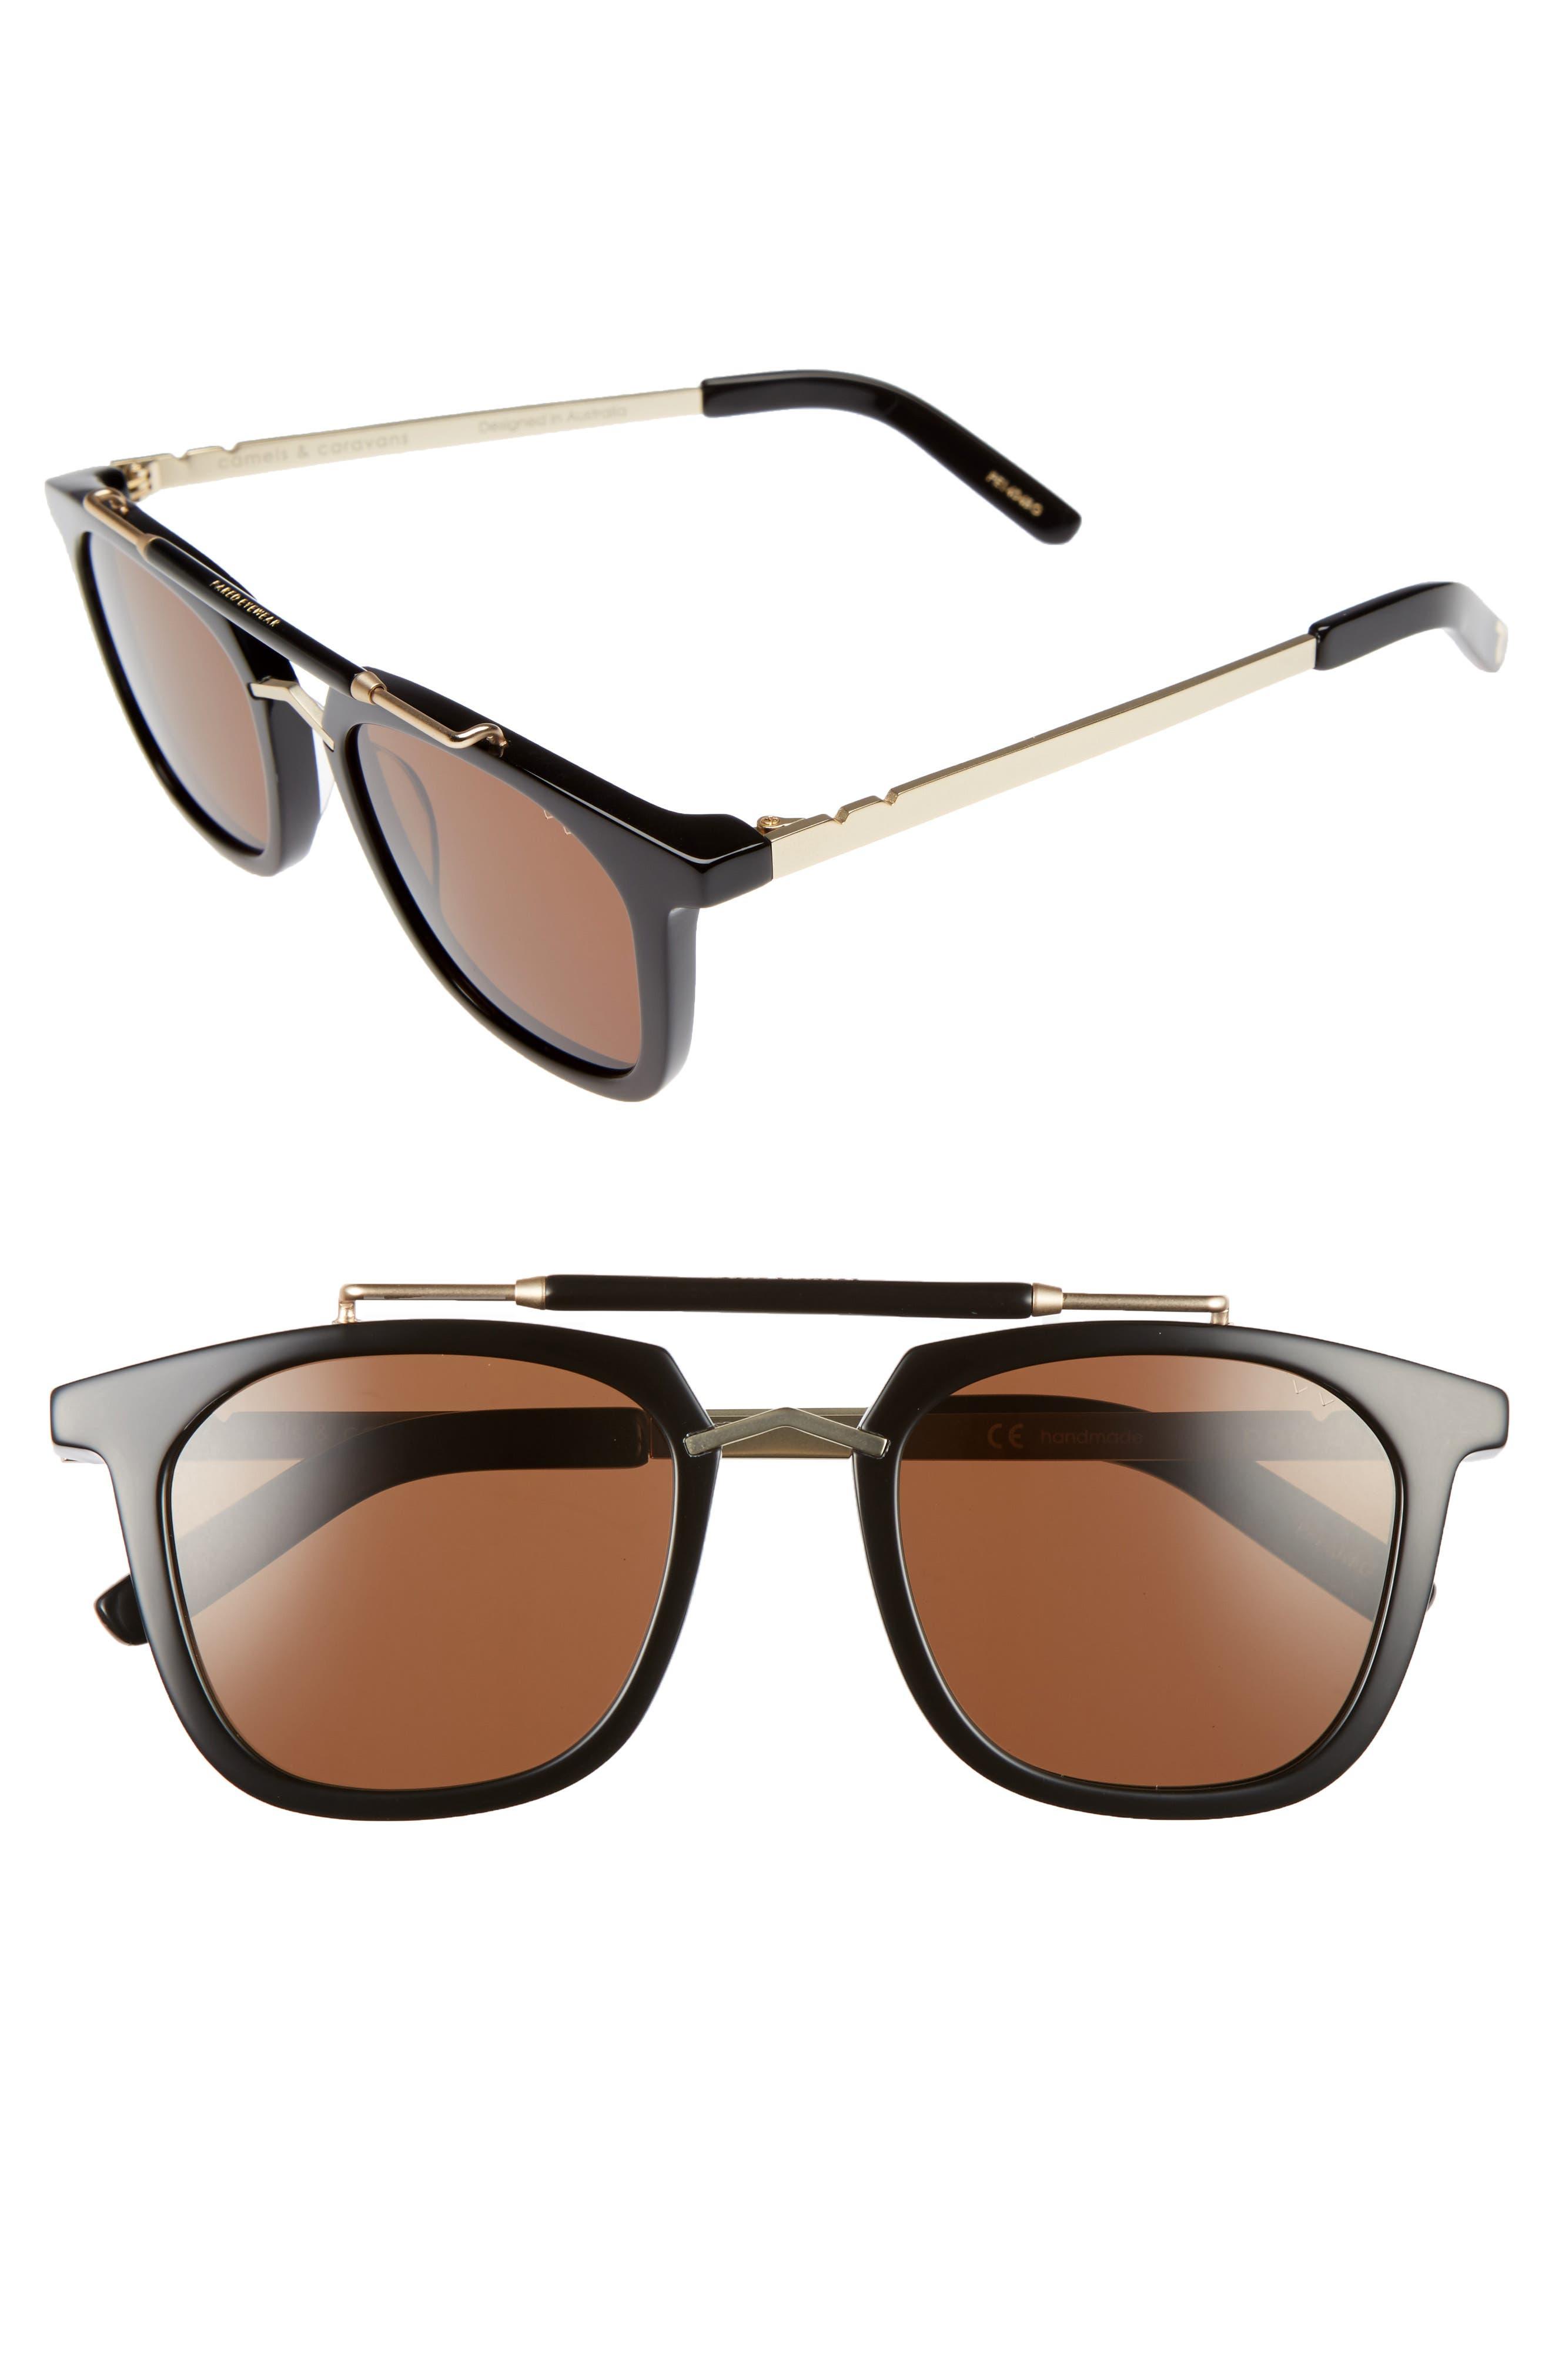 Camels & Caravans 50mm Retro Sunglasses,                         Main,                         color, BLACK/ GOLD BROWN